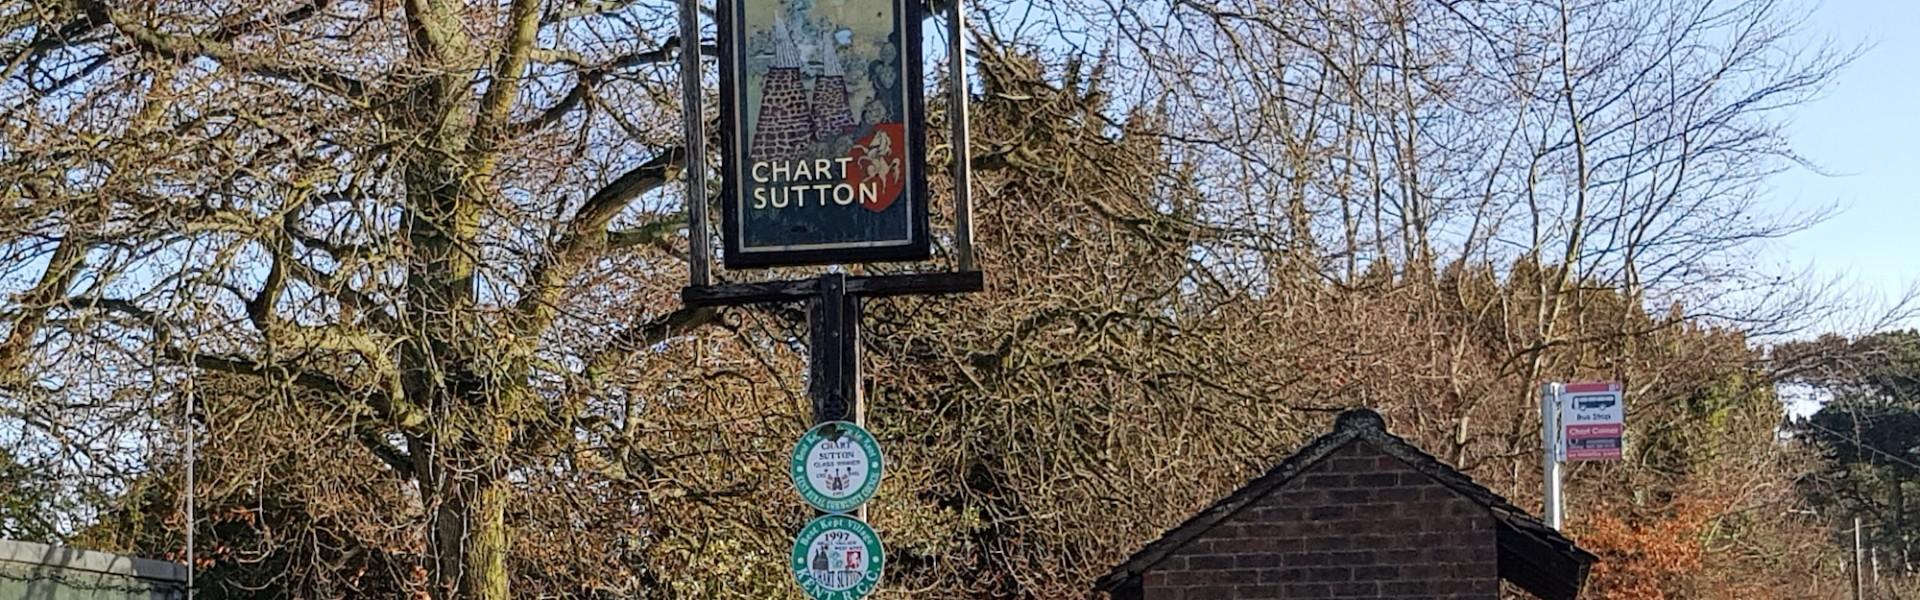 Chart Sutton